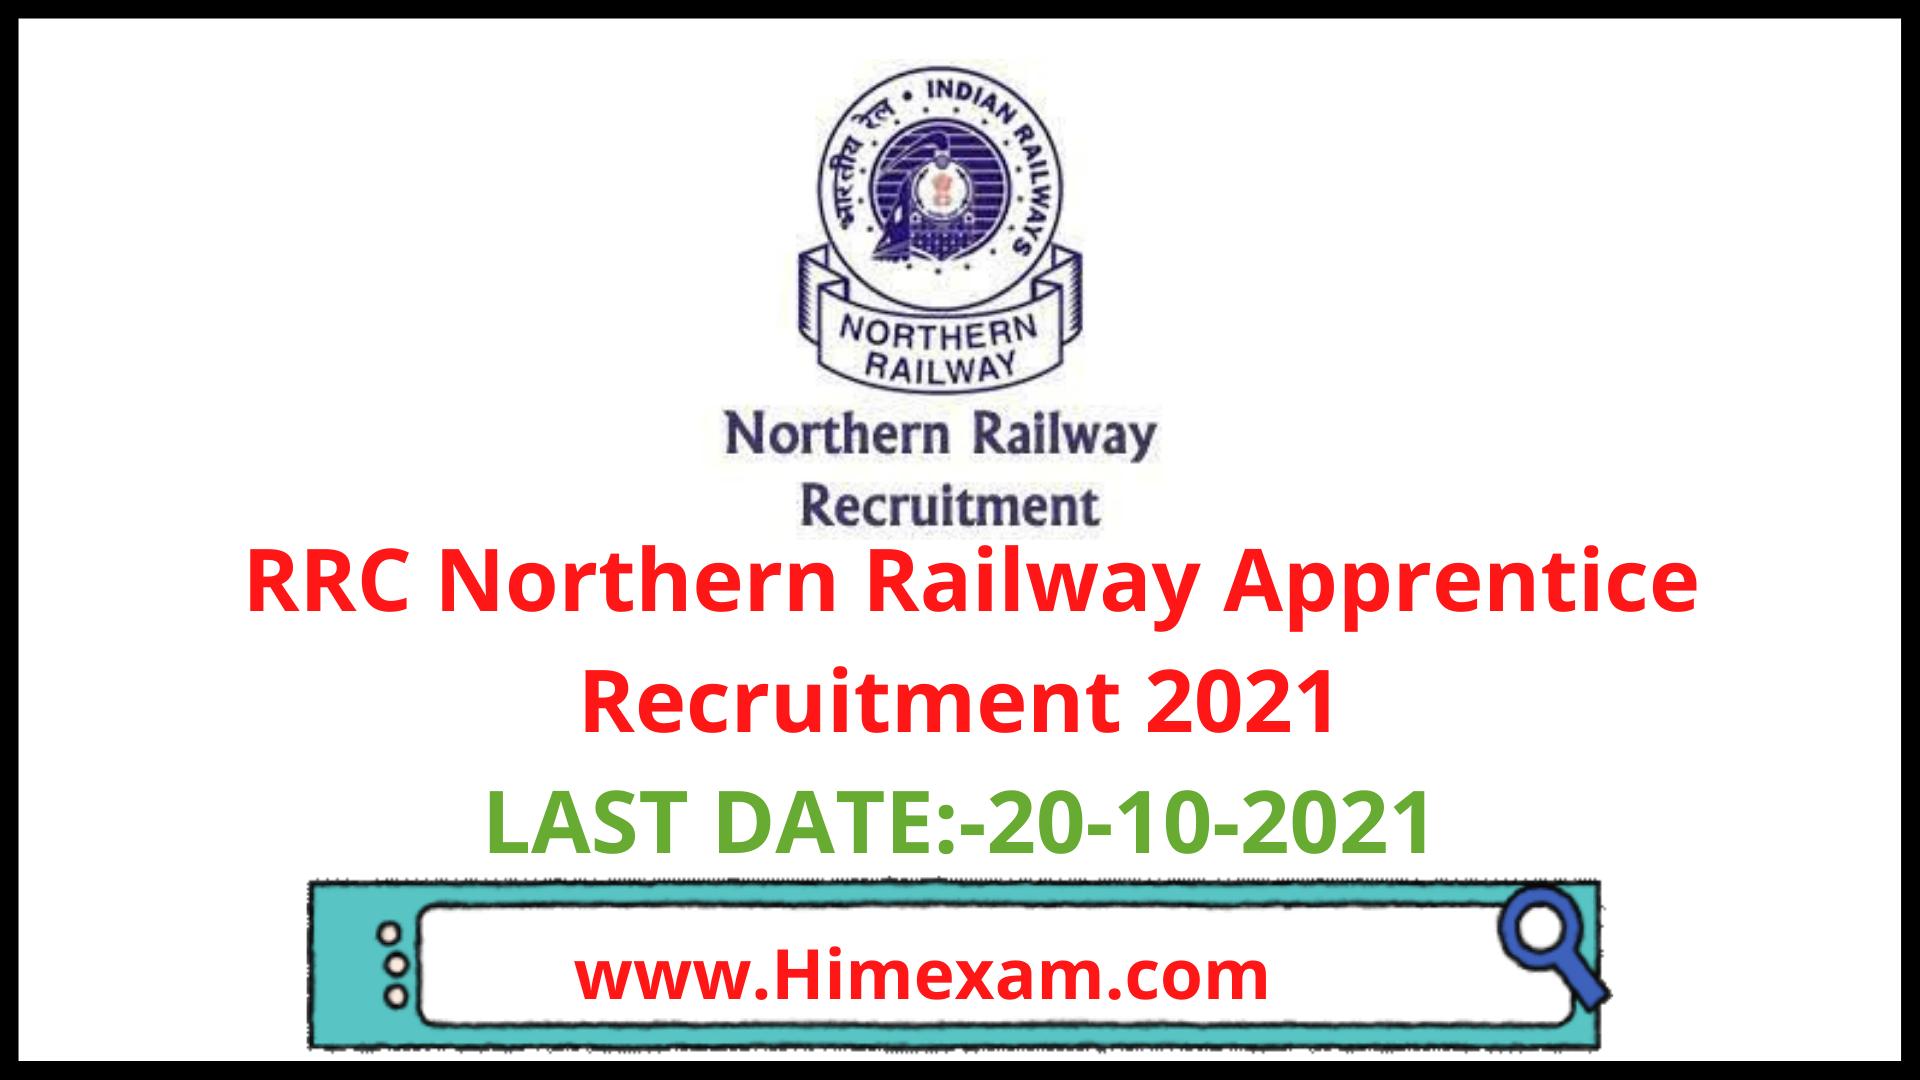 RRC Northern Railway Apprentice Recruitment 2021